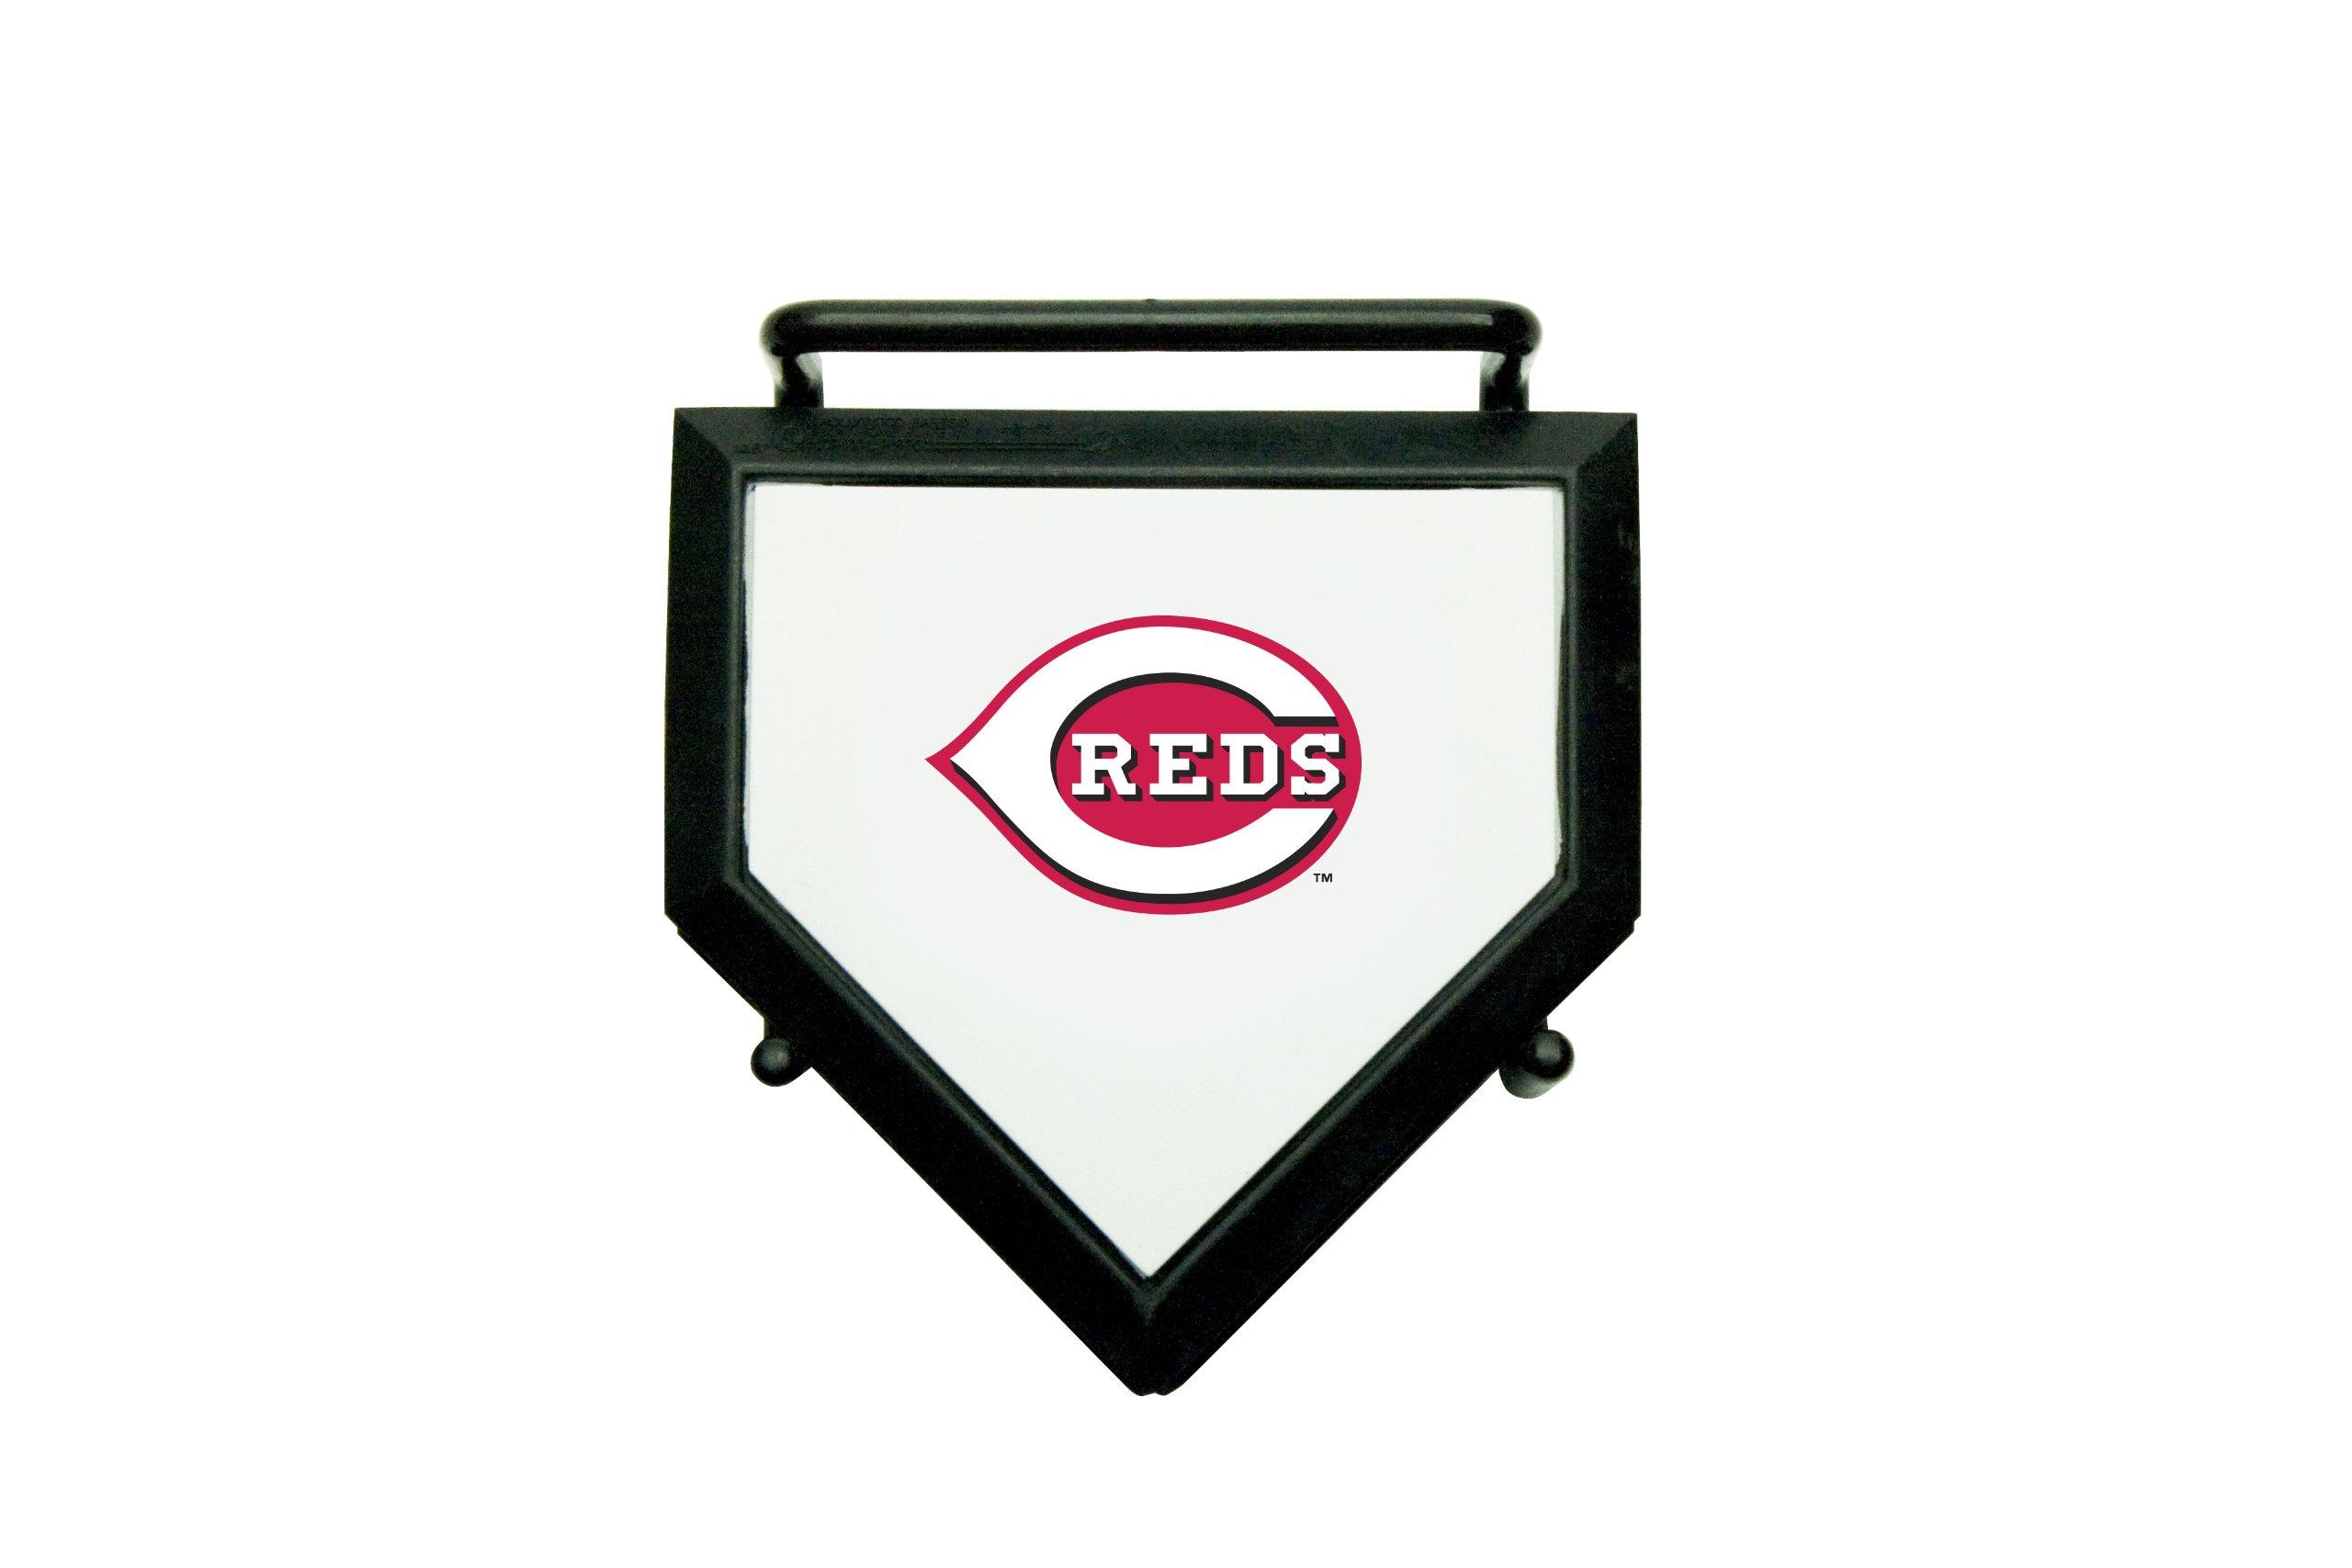 MLB Cincinnati Reds Home Plate 4-pack Coaster Set